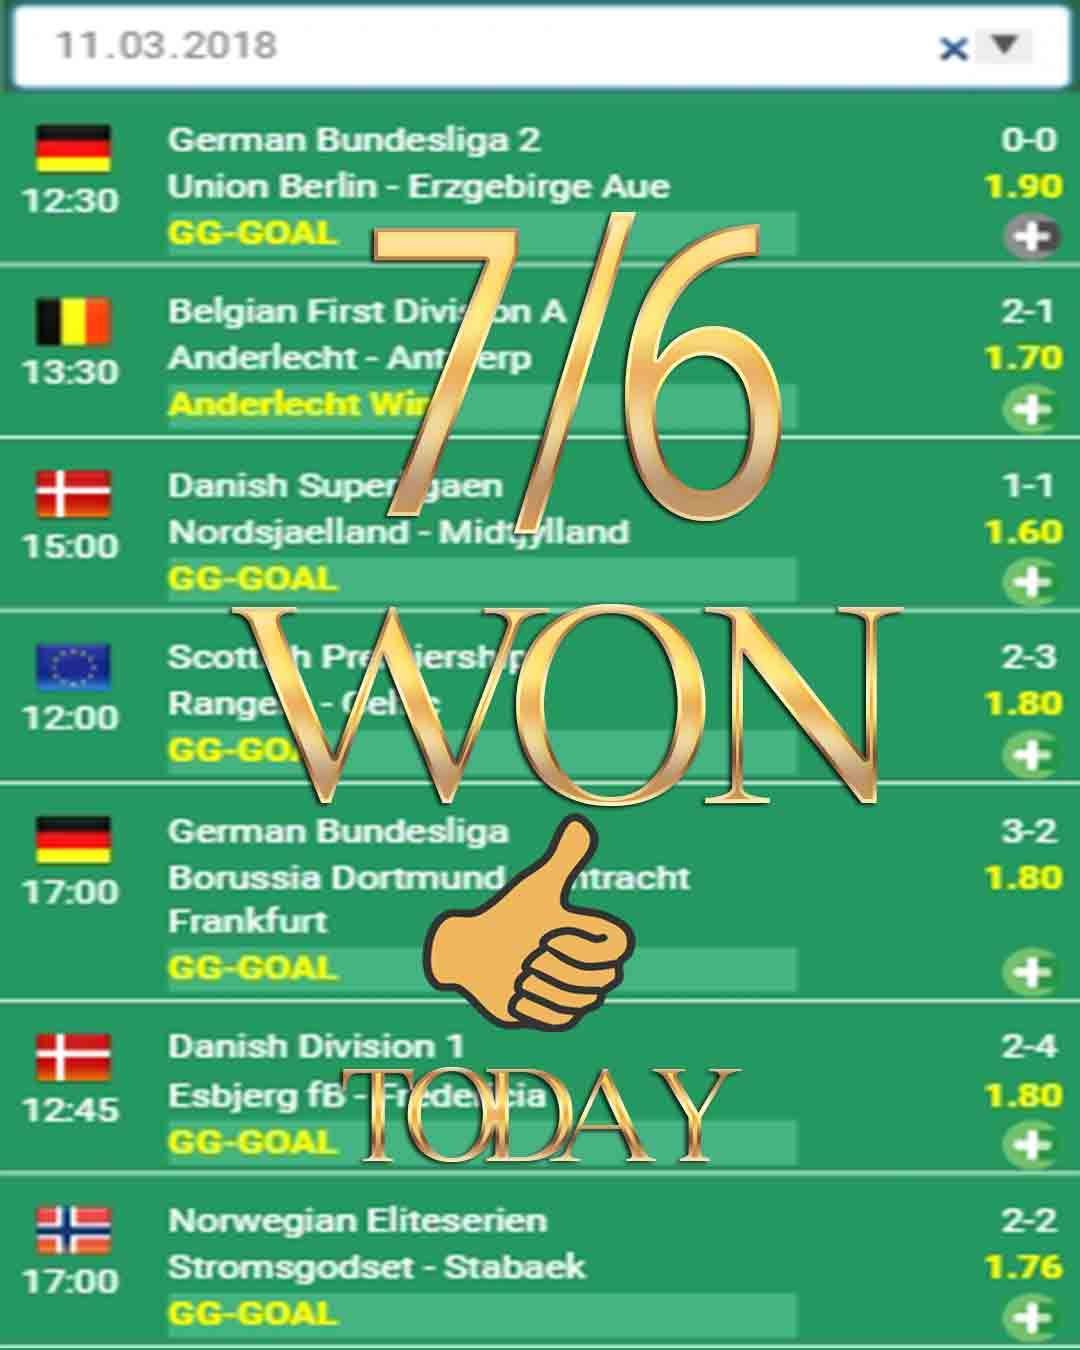 Vip betting sports 7/6 WON sports betting, sport betting